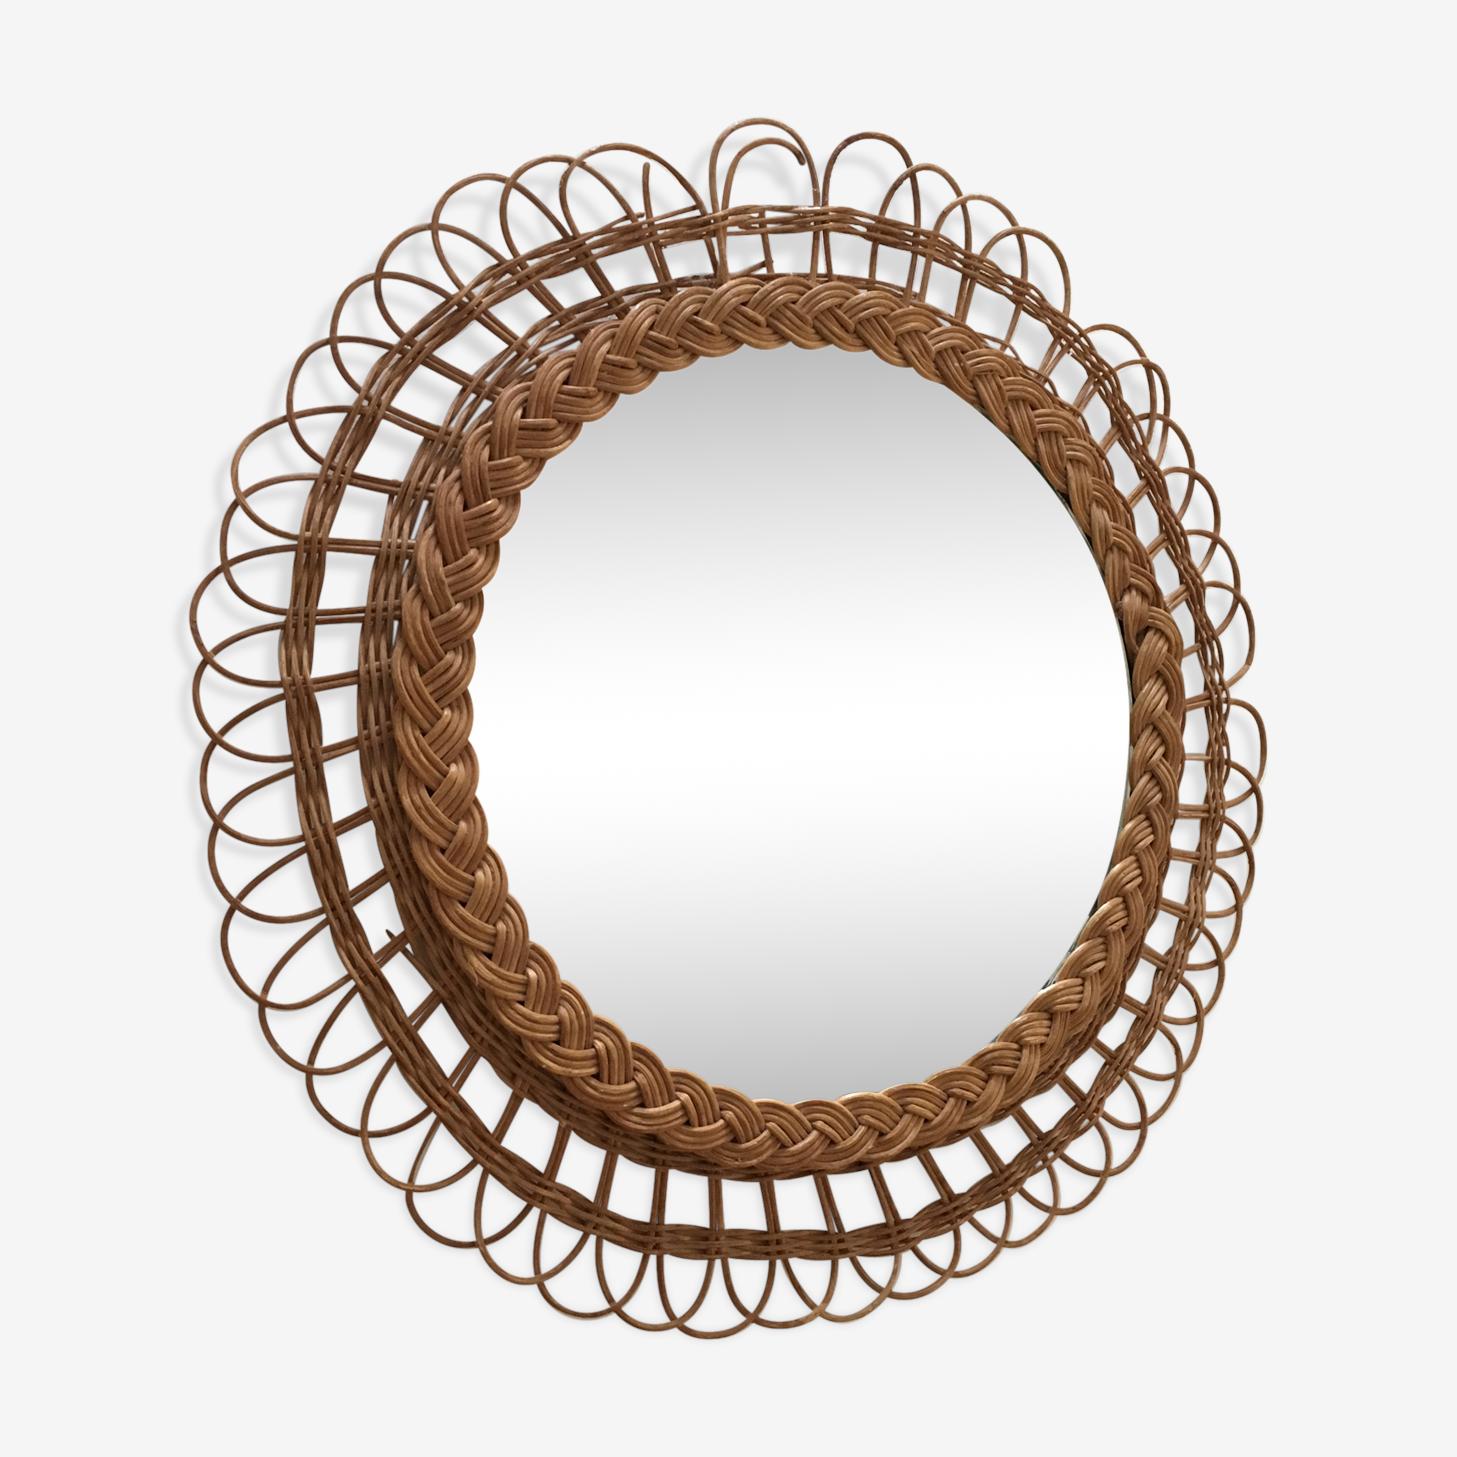 Former Sun braided rattan 40 cm mirror